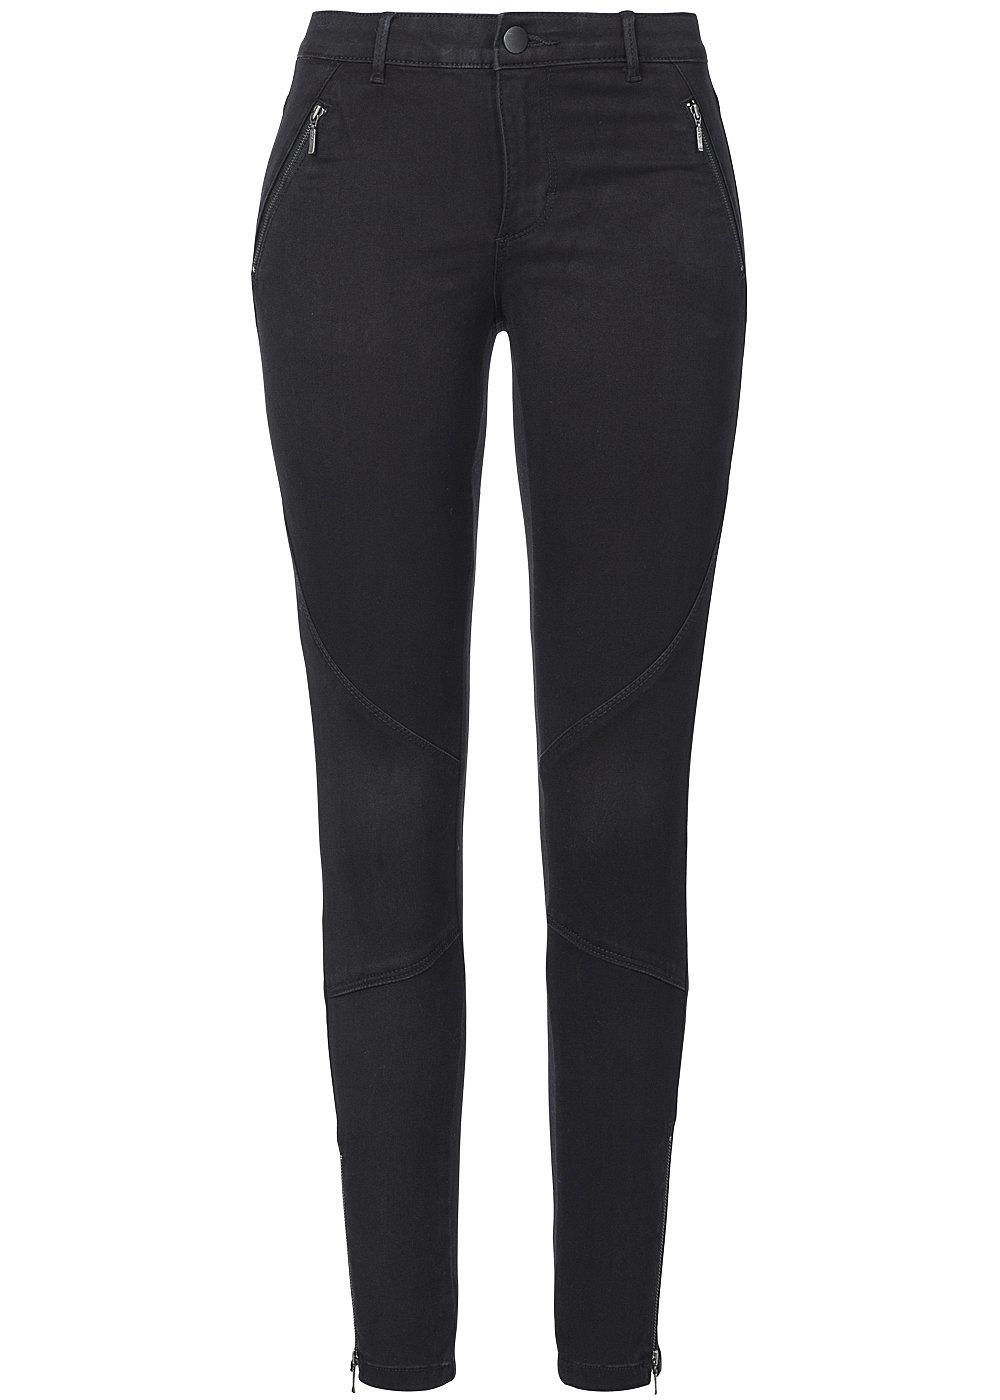 only damen skinny jeans moto 15103501 2 deko zipper zipper am bein. Black Bedroom Furniture Sets. Home Design Ideas